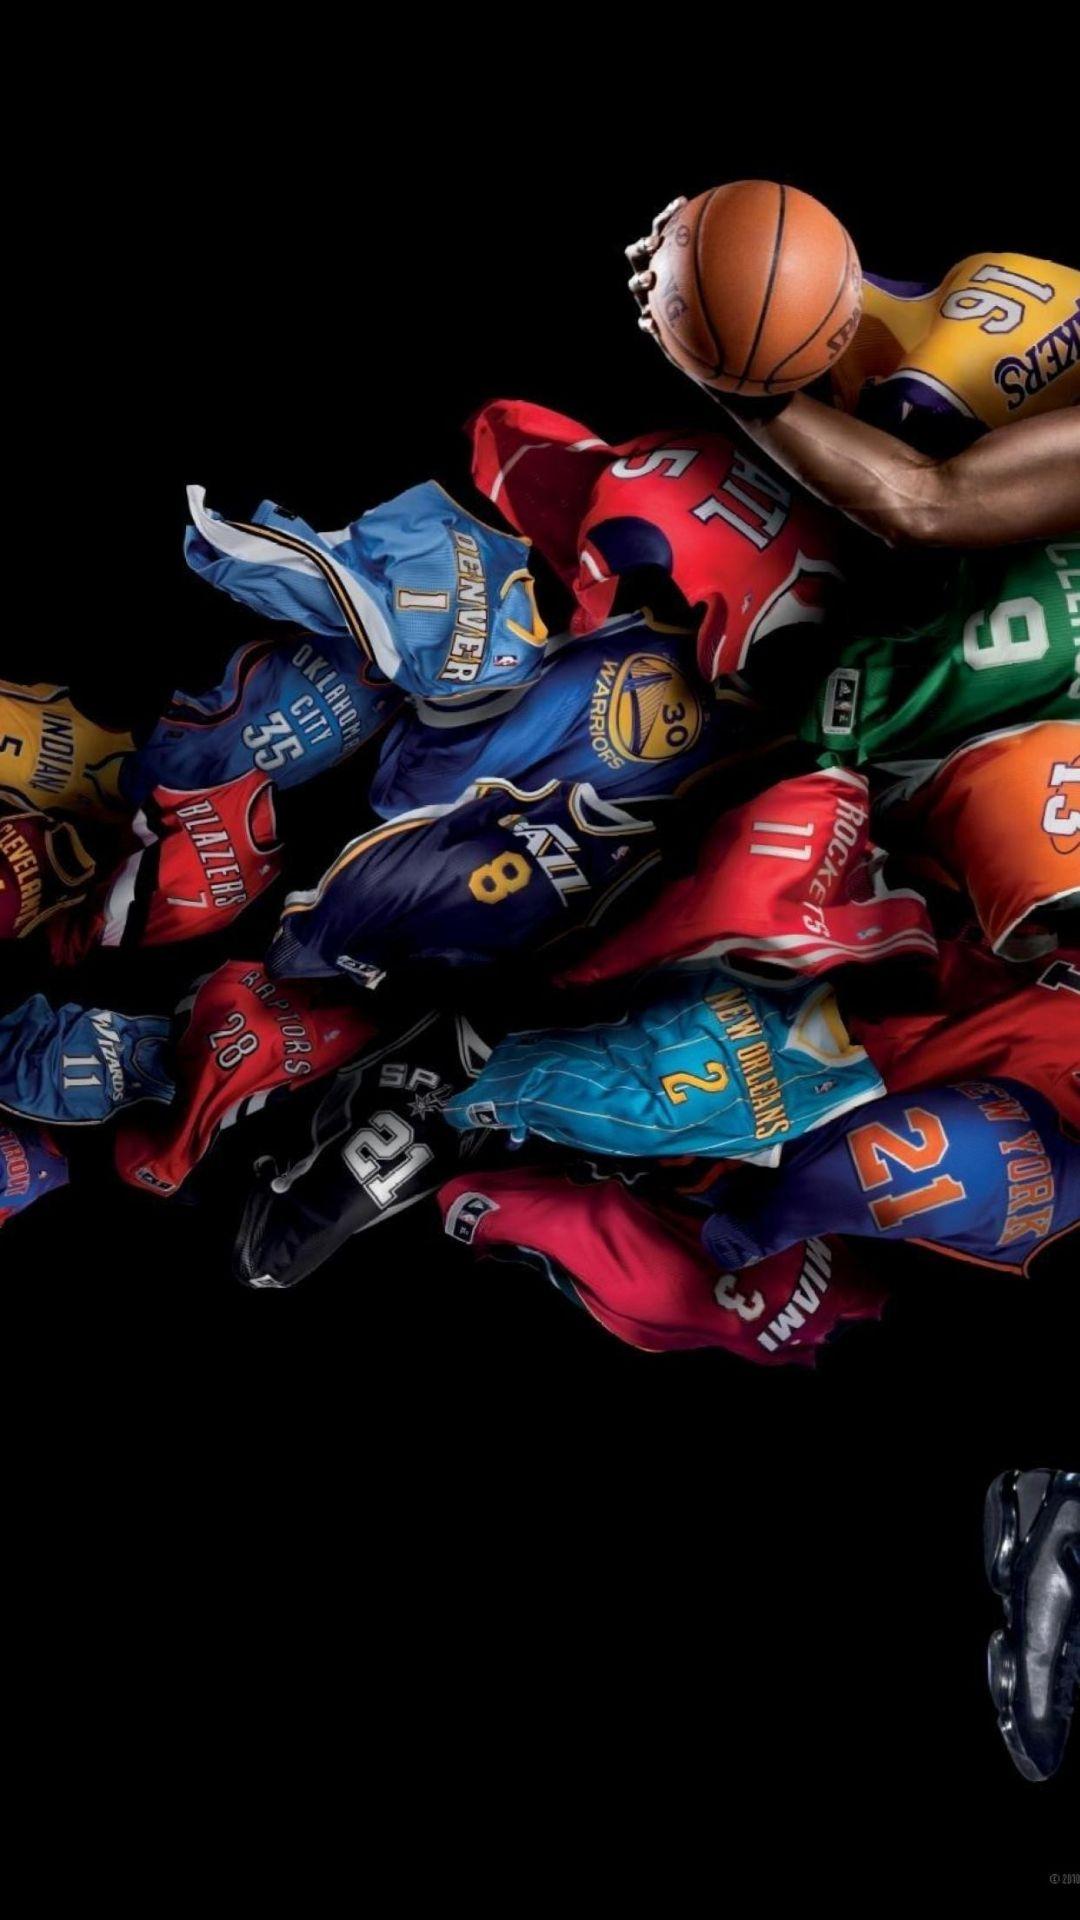 Cool Basketball Wallpaper Hd Basketball Wallpapers Hd Nba Wallpapers Cool Basketball Wallpapers